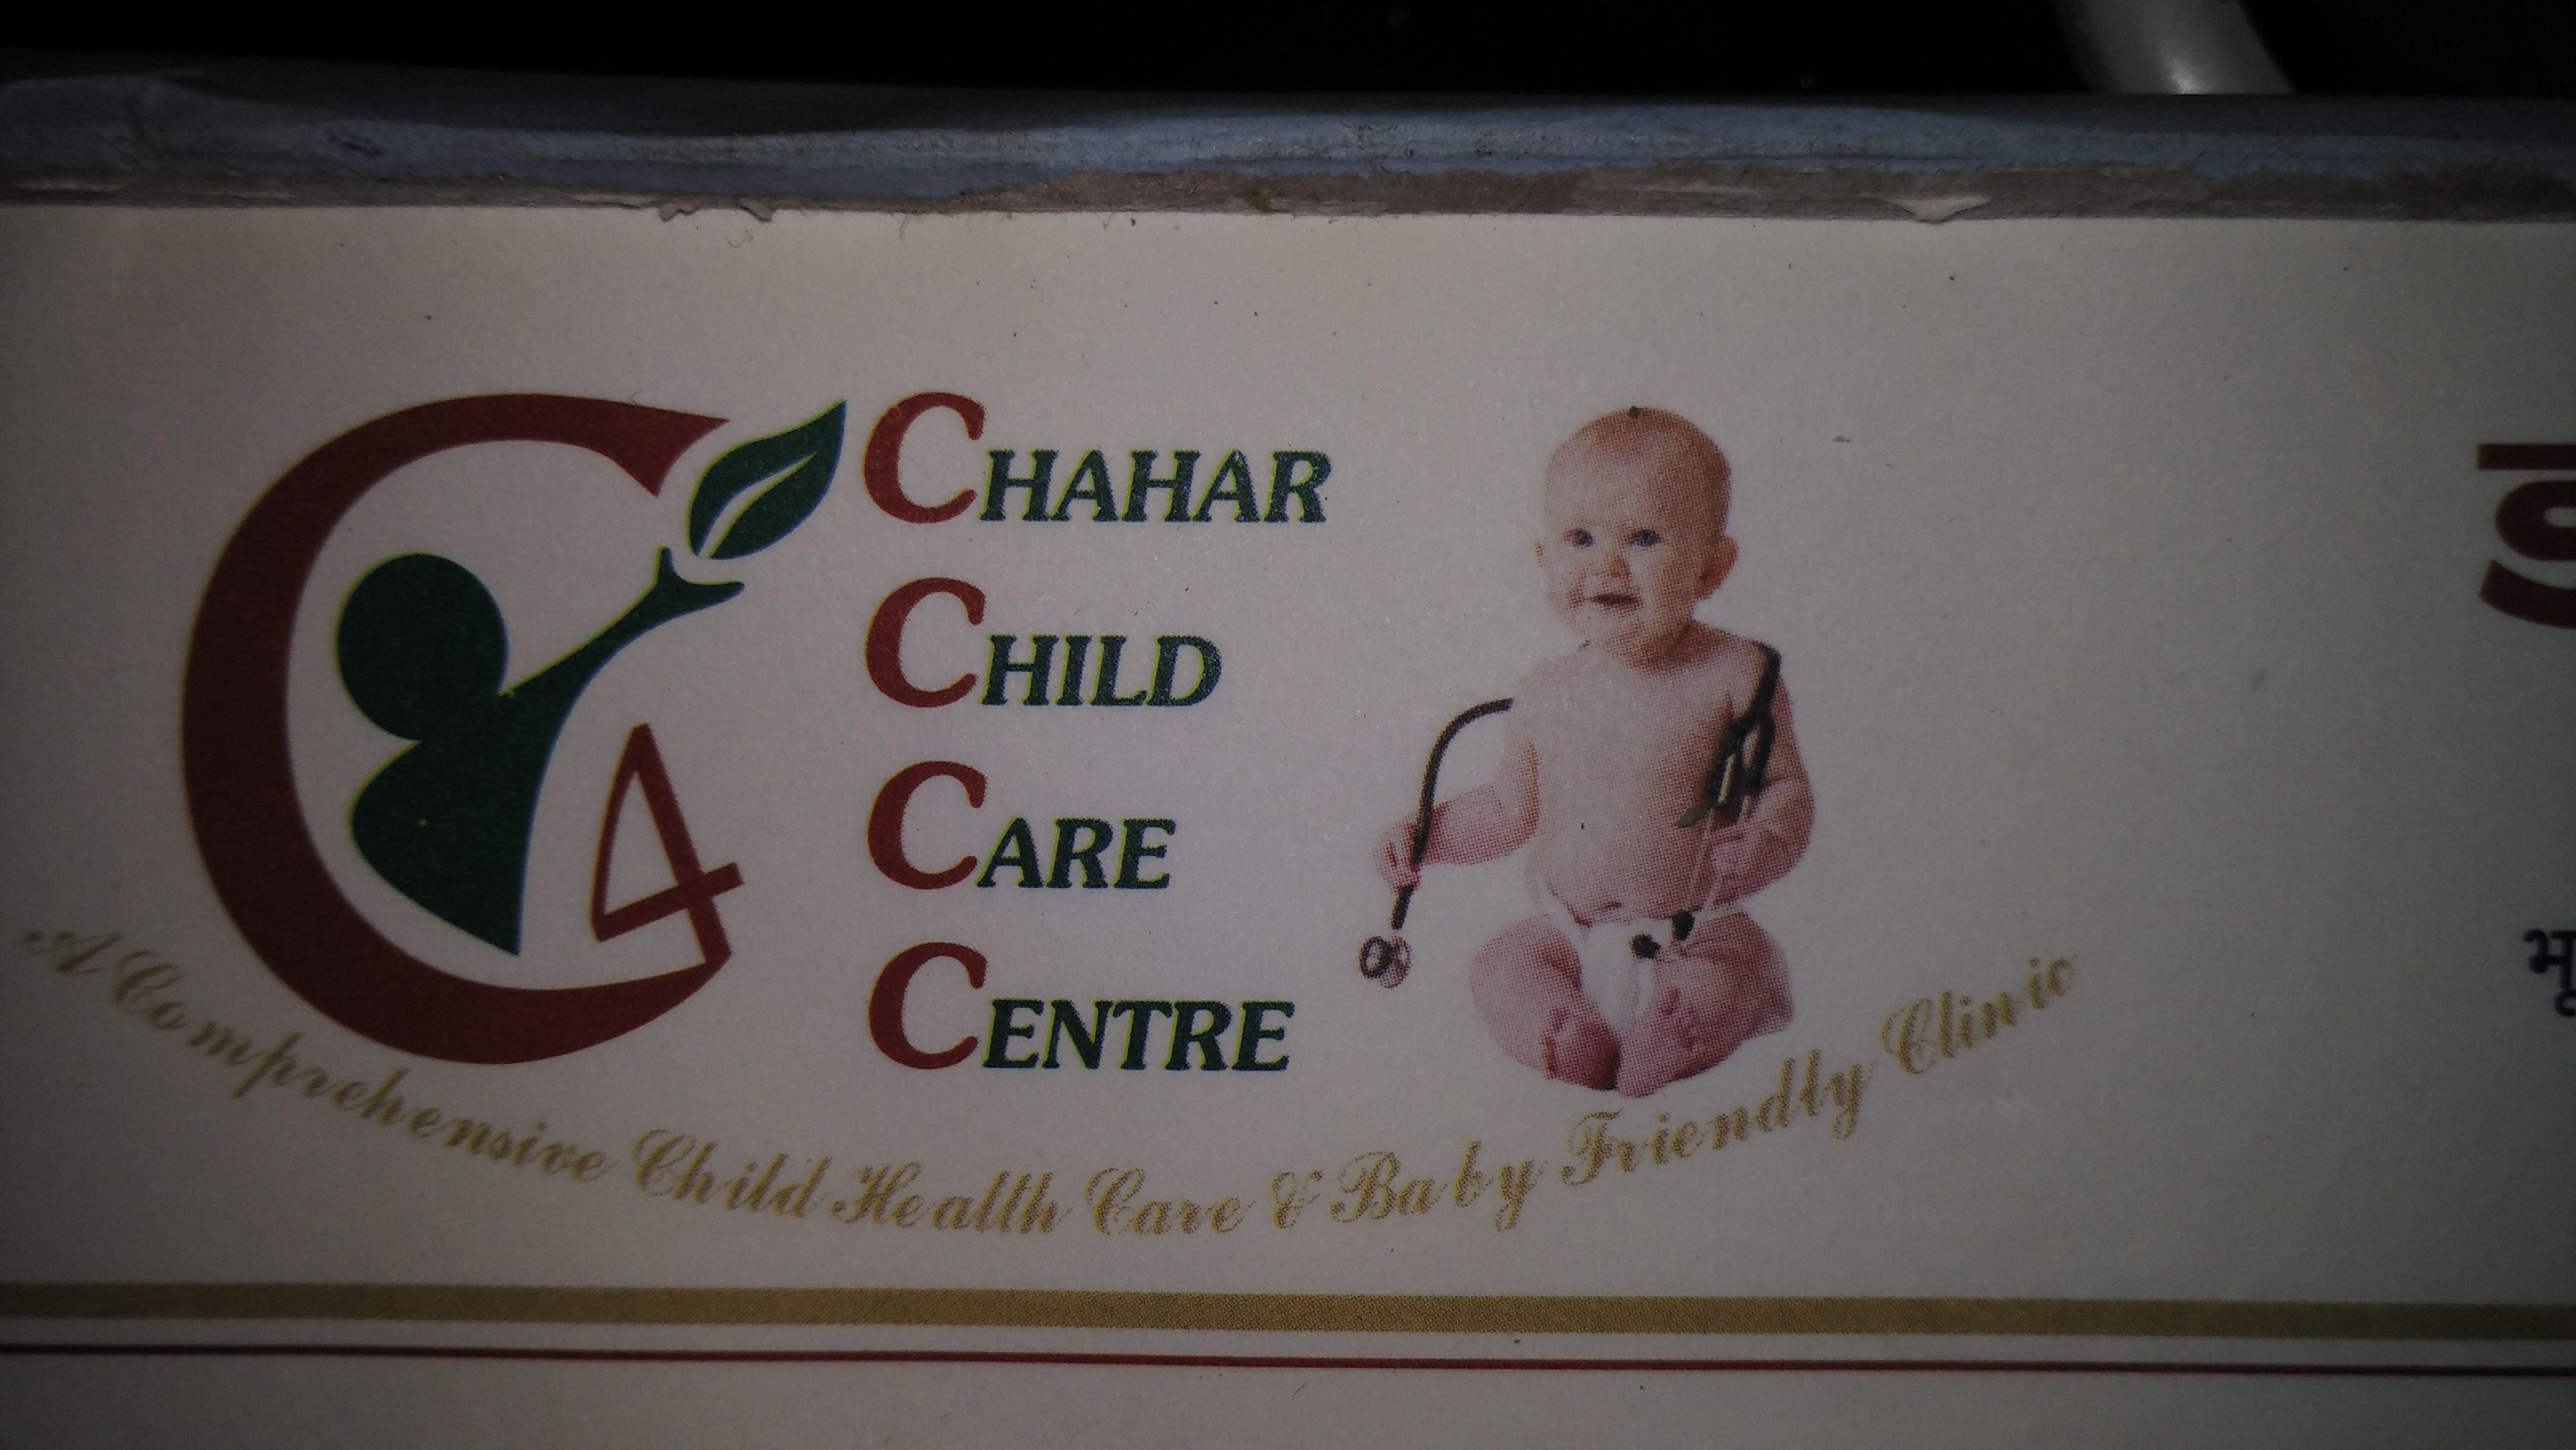 Chahar Child Care Center